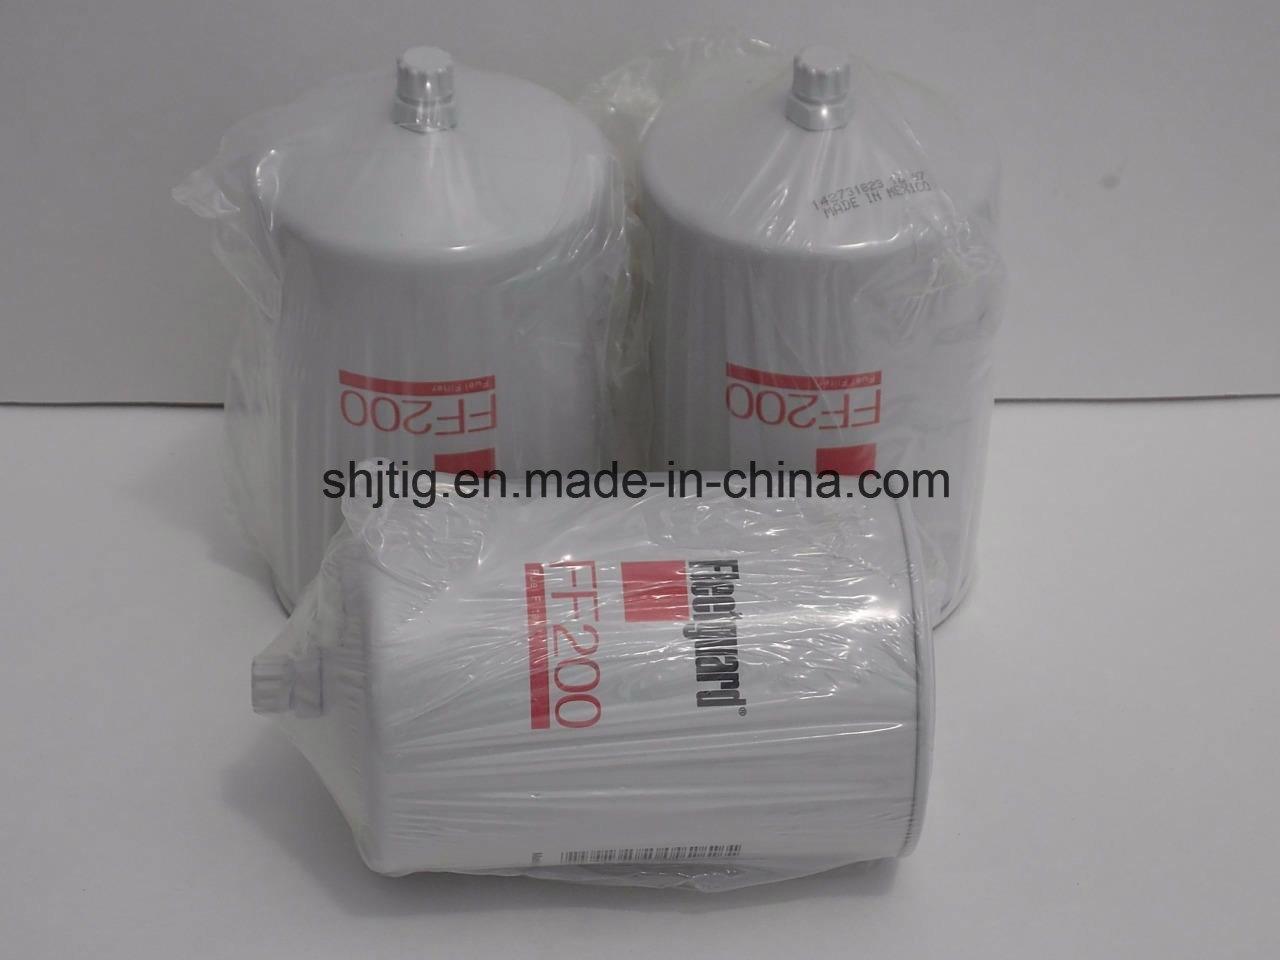 China New Fleetgaurd Ff200 Fuel Filter 33353 Wrapped 6 5l Housing Oil